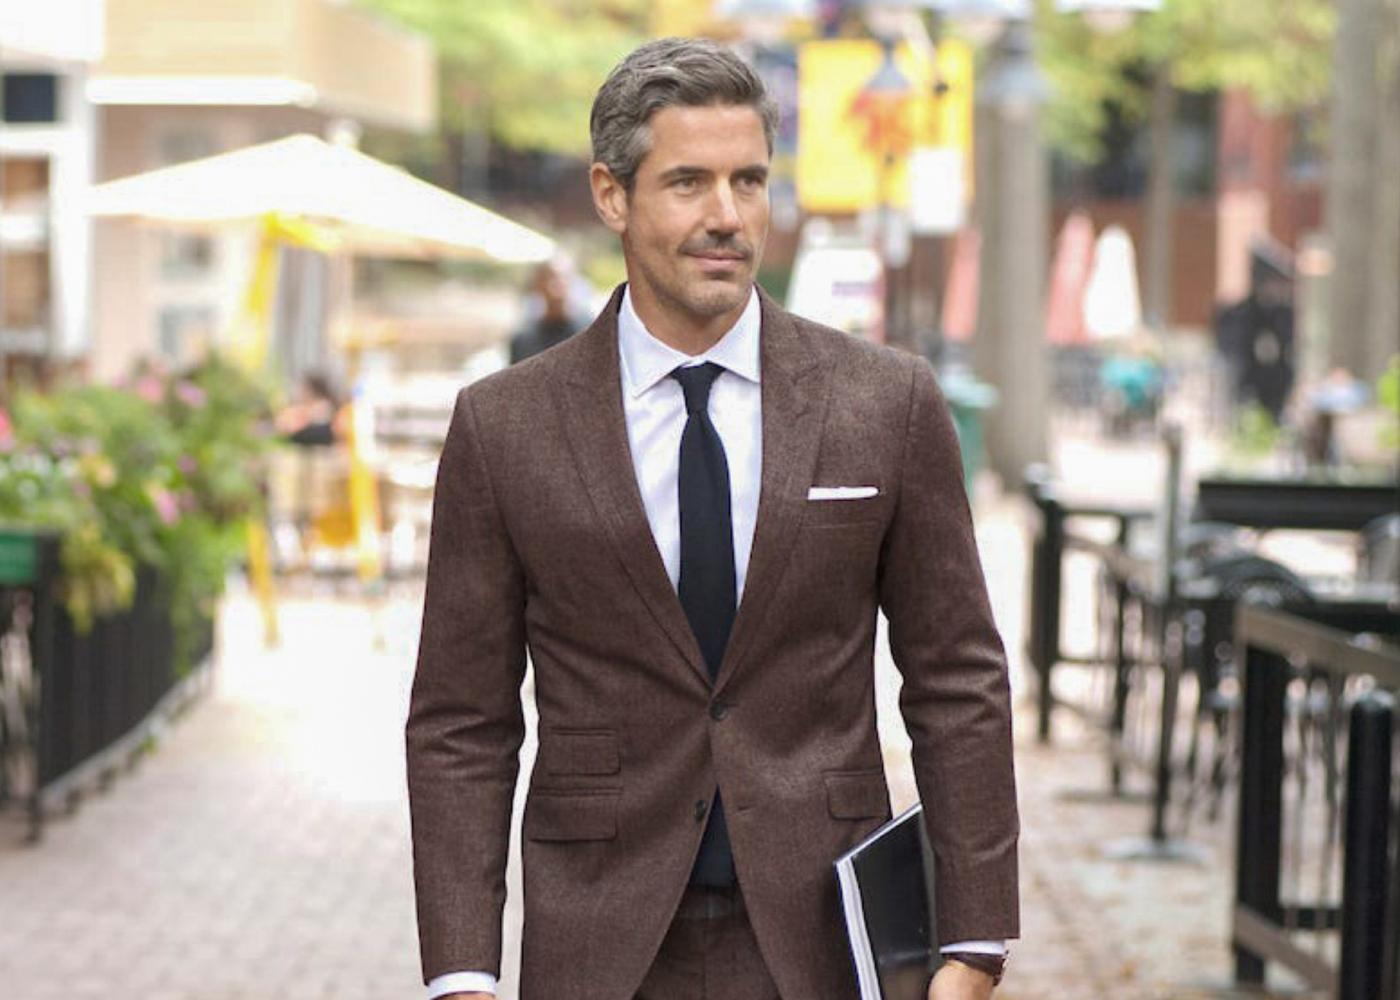 brown suit & white shirt color combinations